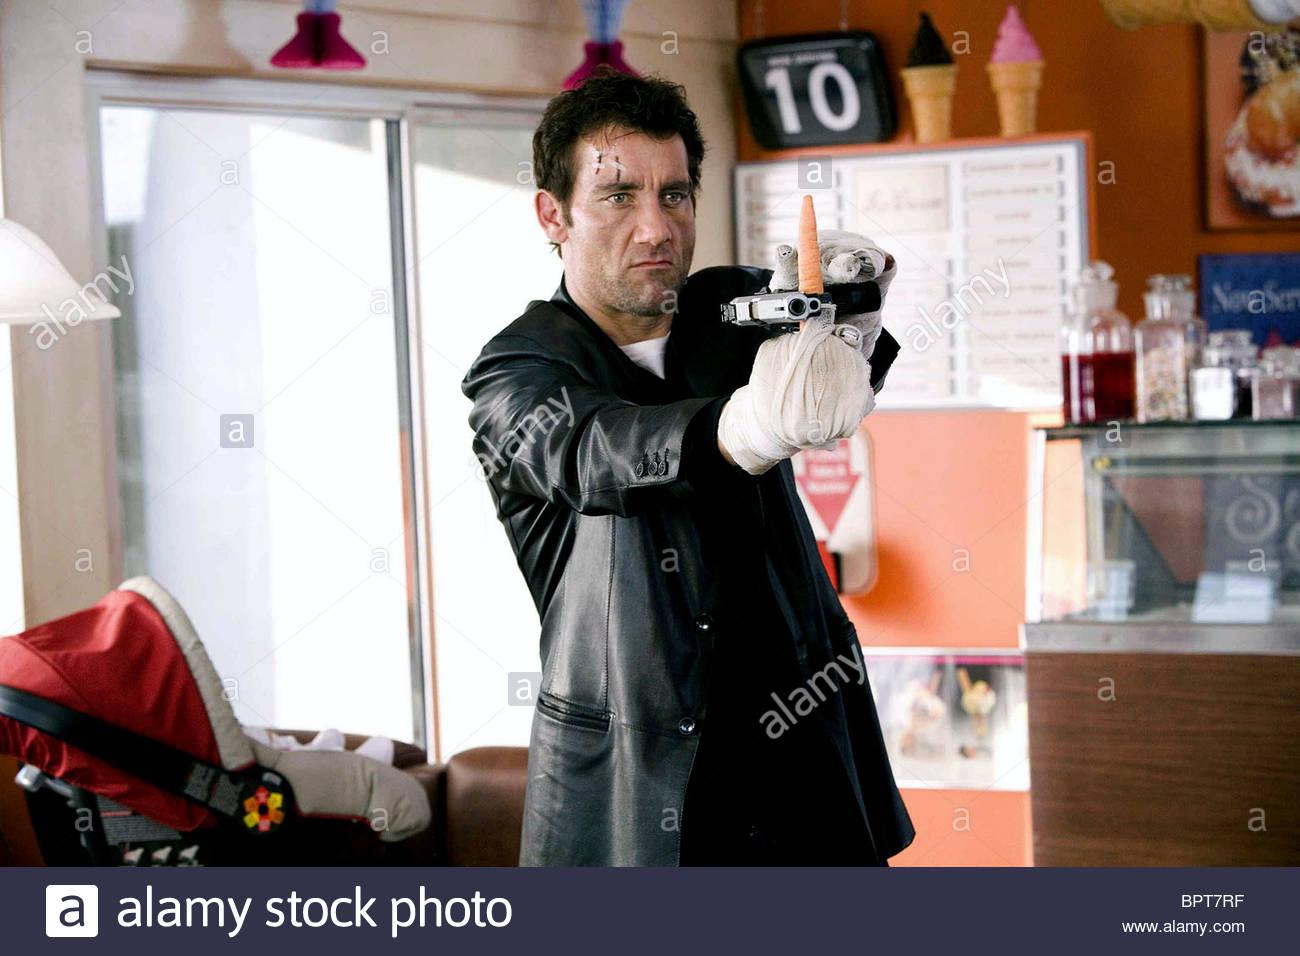 CLIVE OWEN SHOOT 'EM UP (2007) - Stock Image